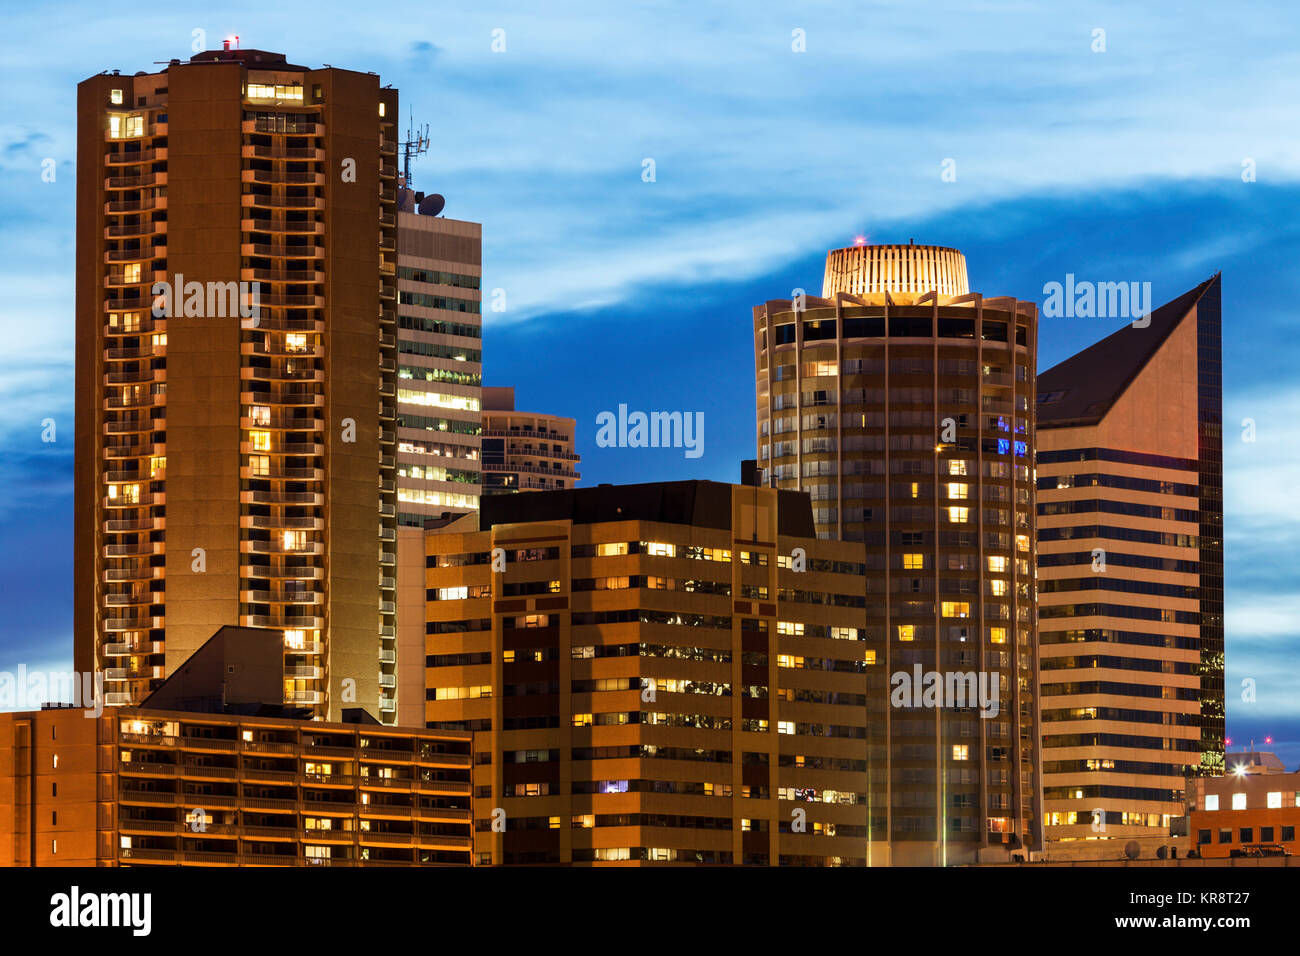 Canada, Alberta, Edmonton, Skyscrapers against moody sky - Stock Image